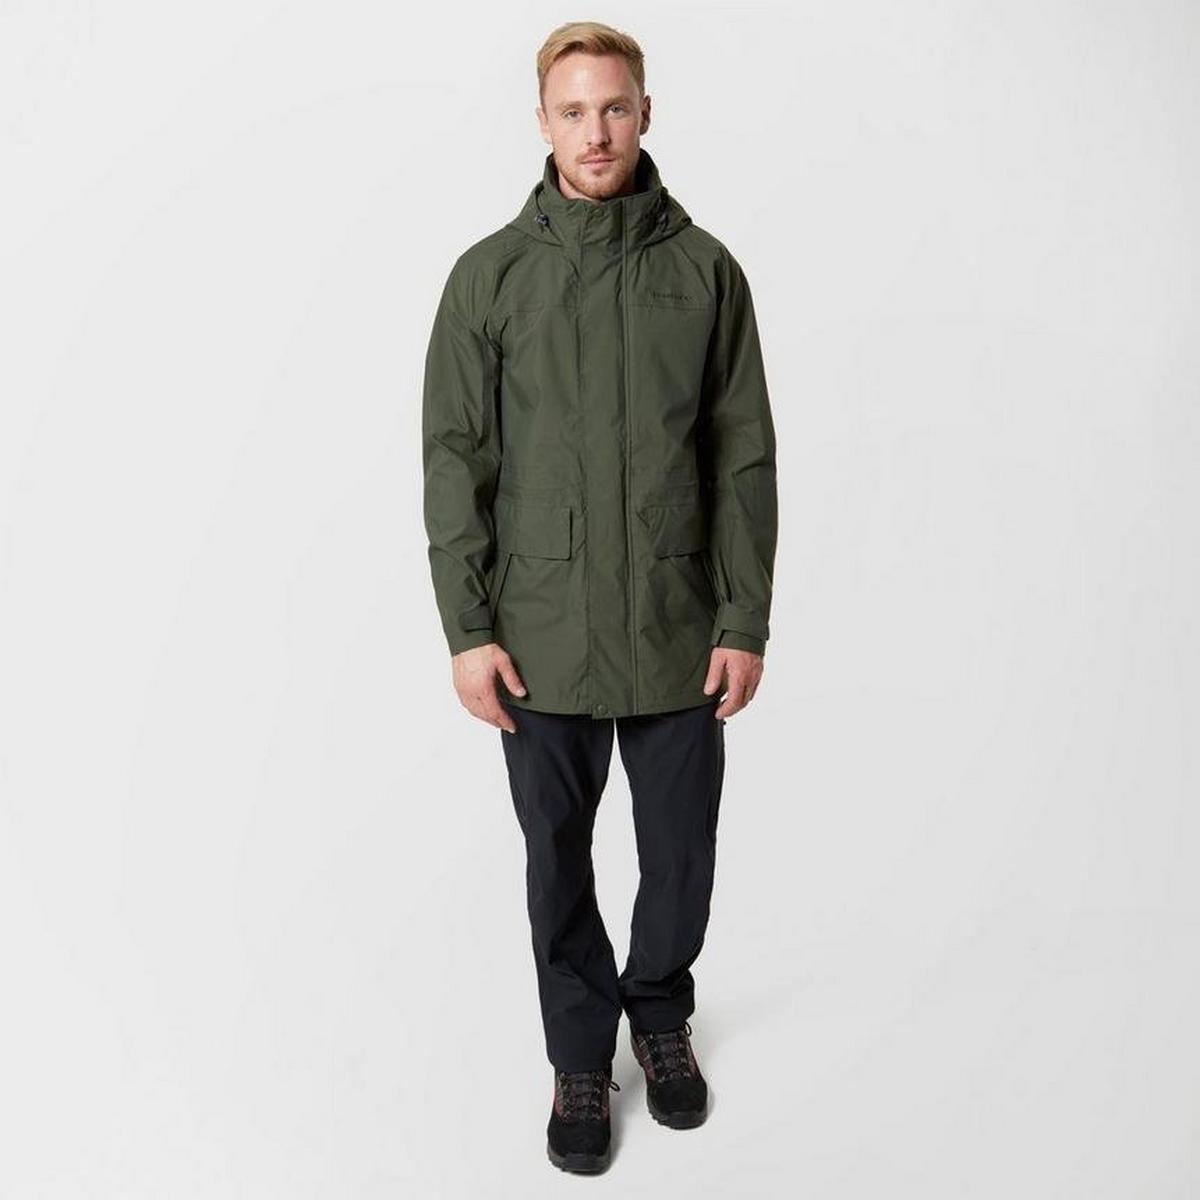 Brasher Men's Grisedale Jacket - Khaki